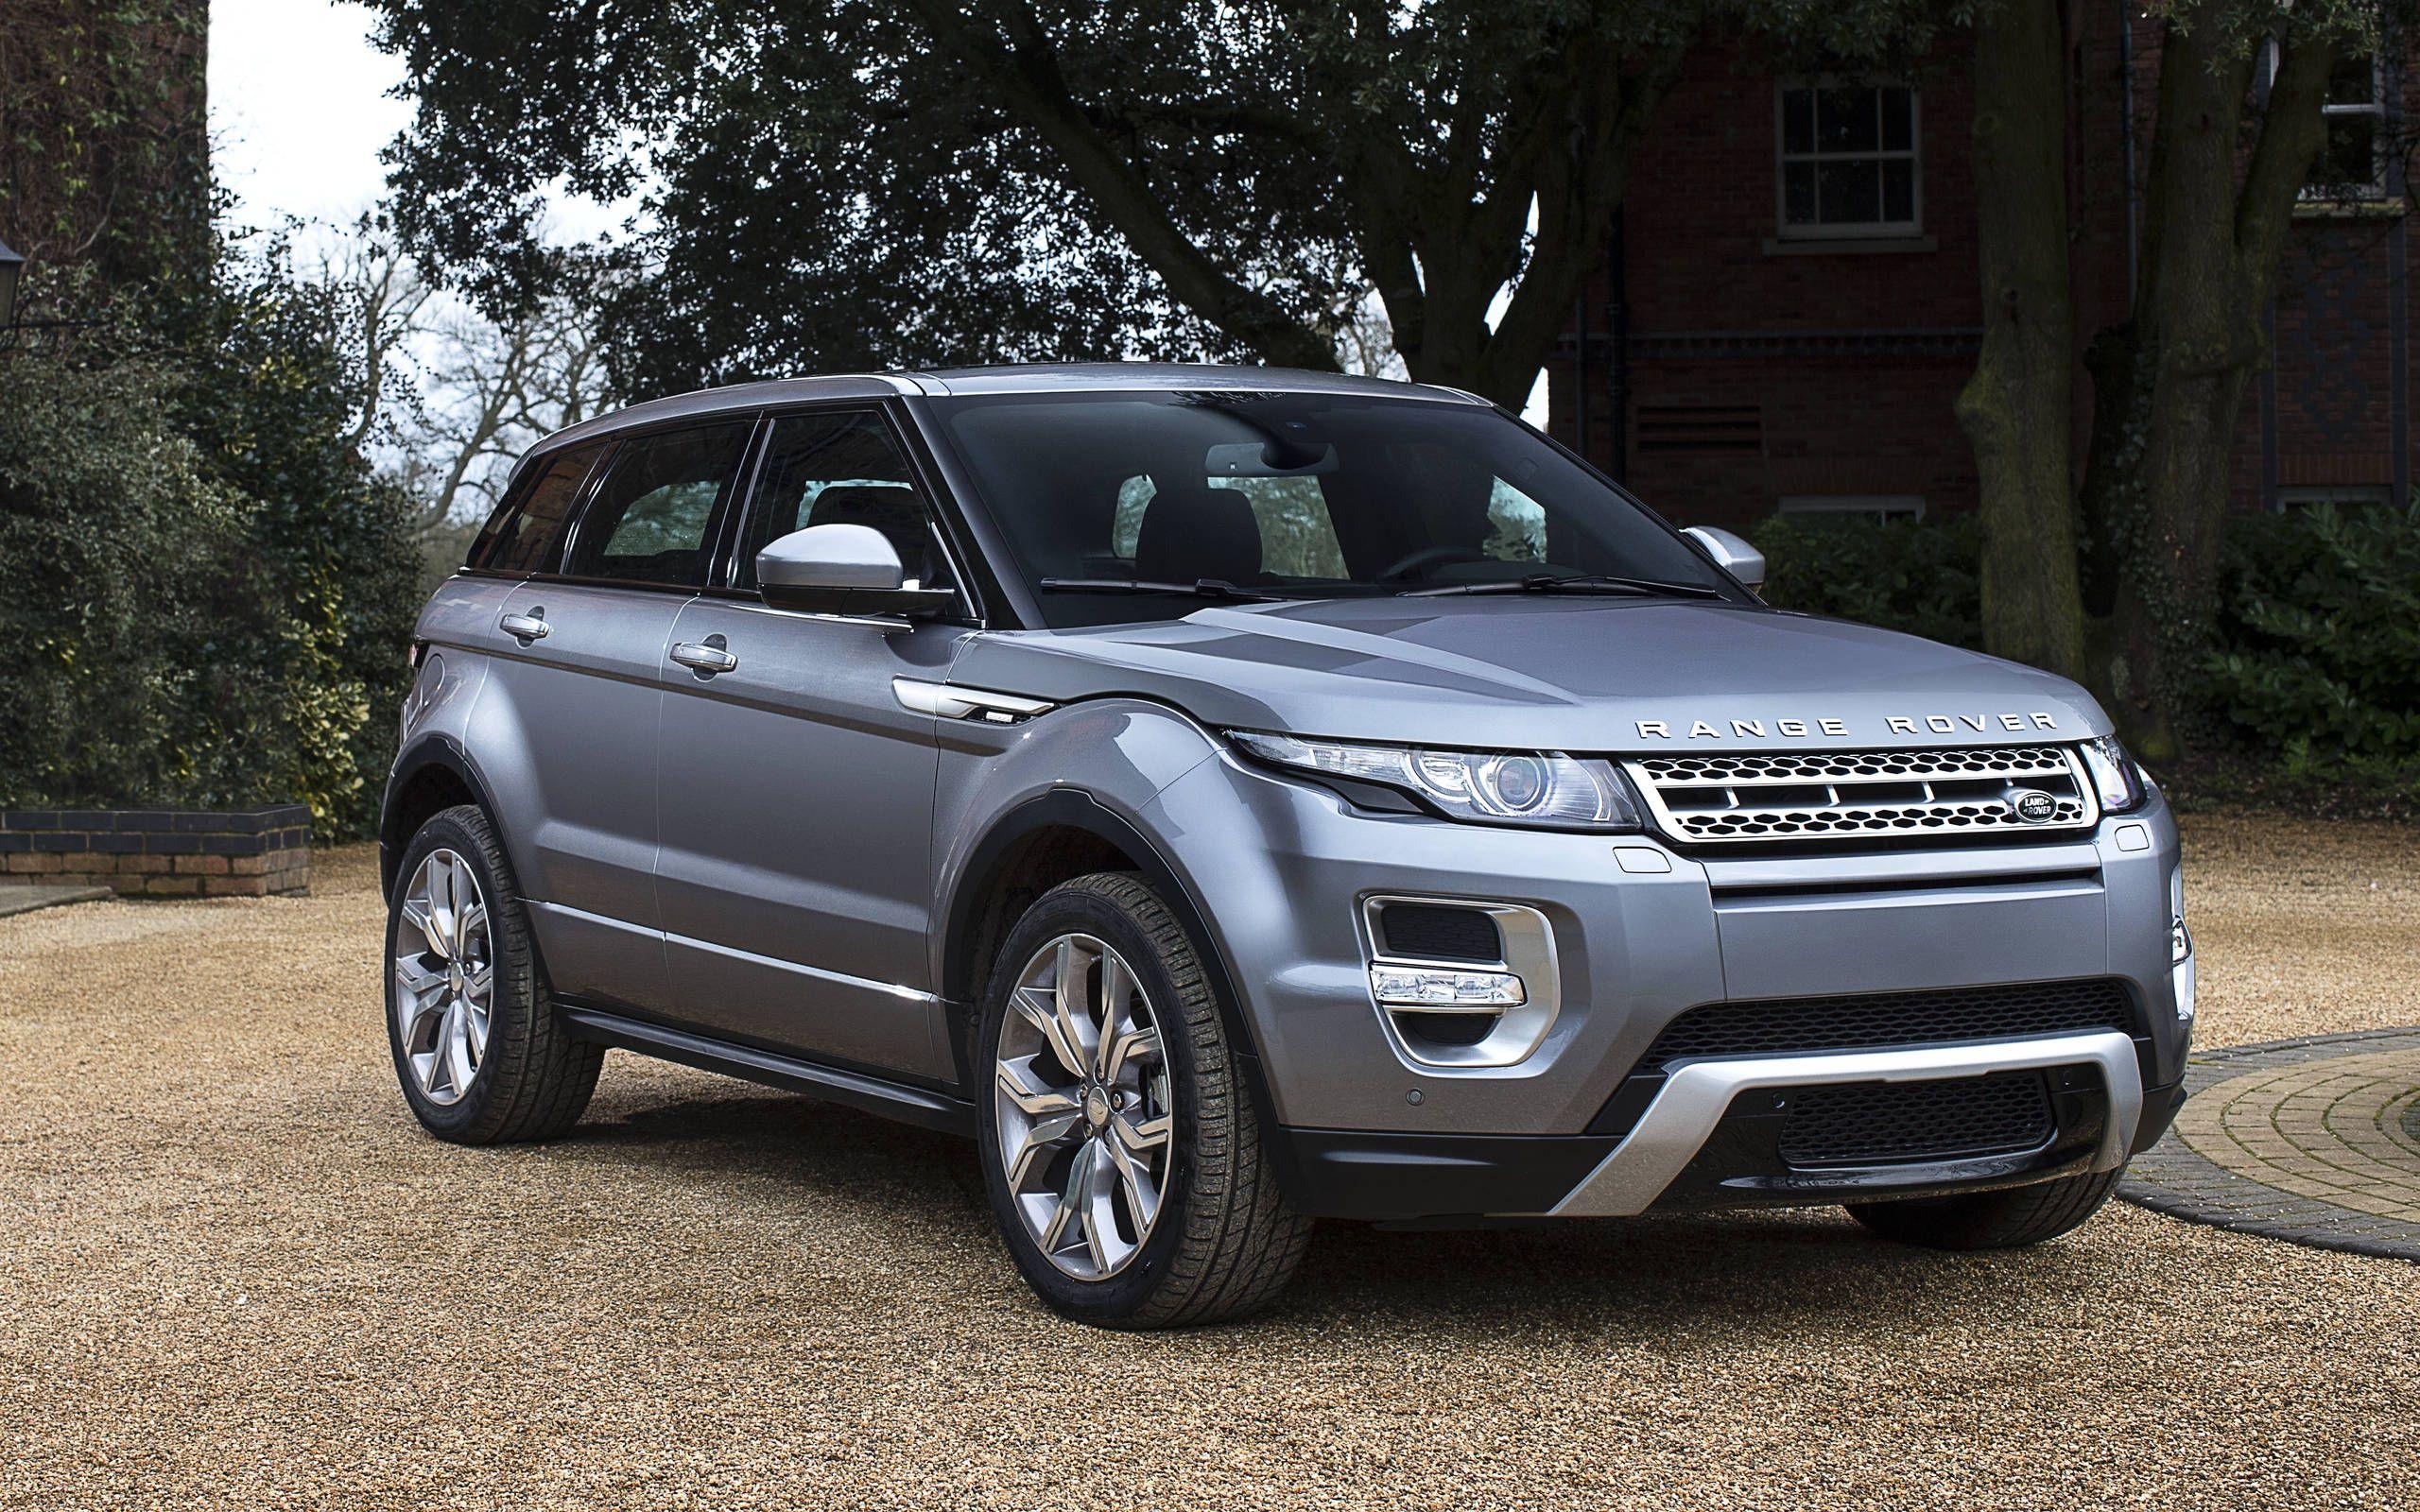 2015 Land Rover Range Rover Evoque Pure Premium Review Notes